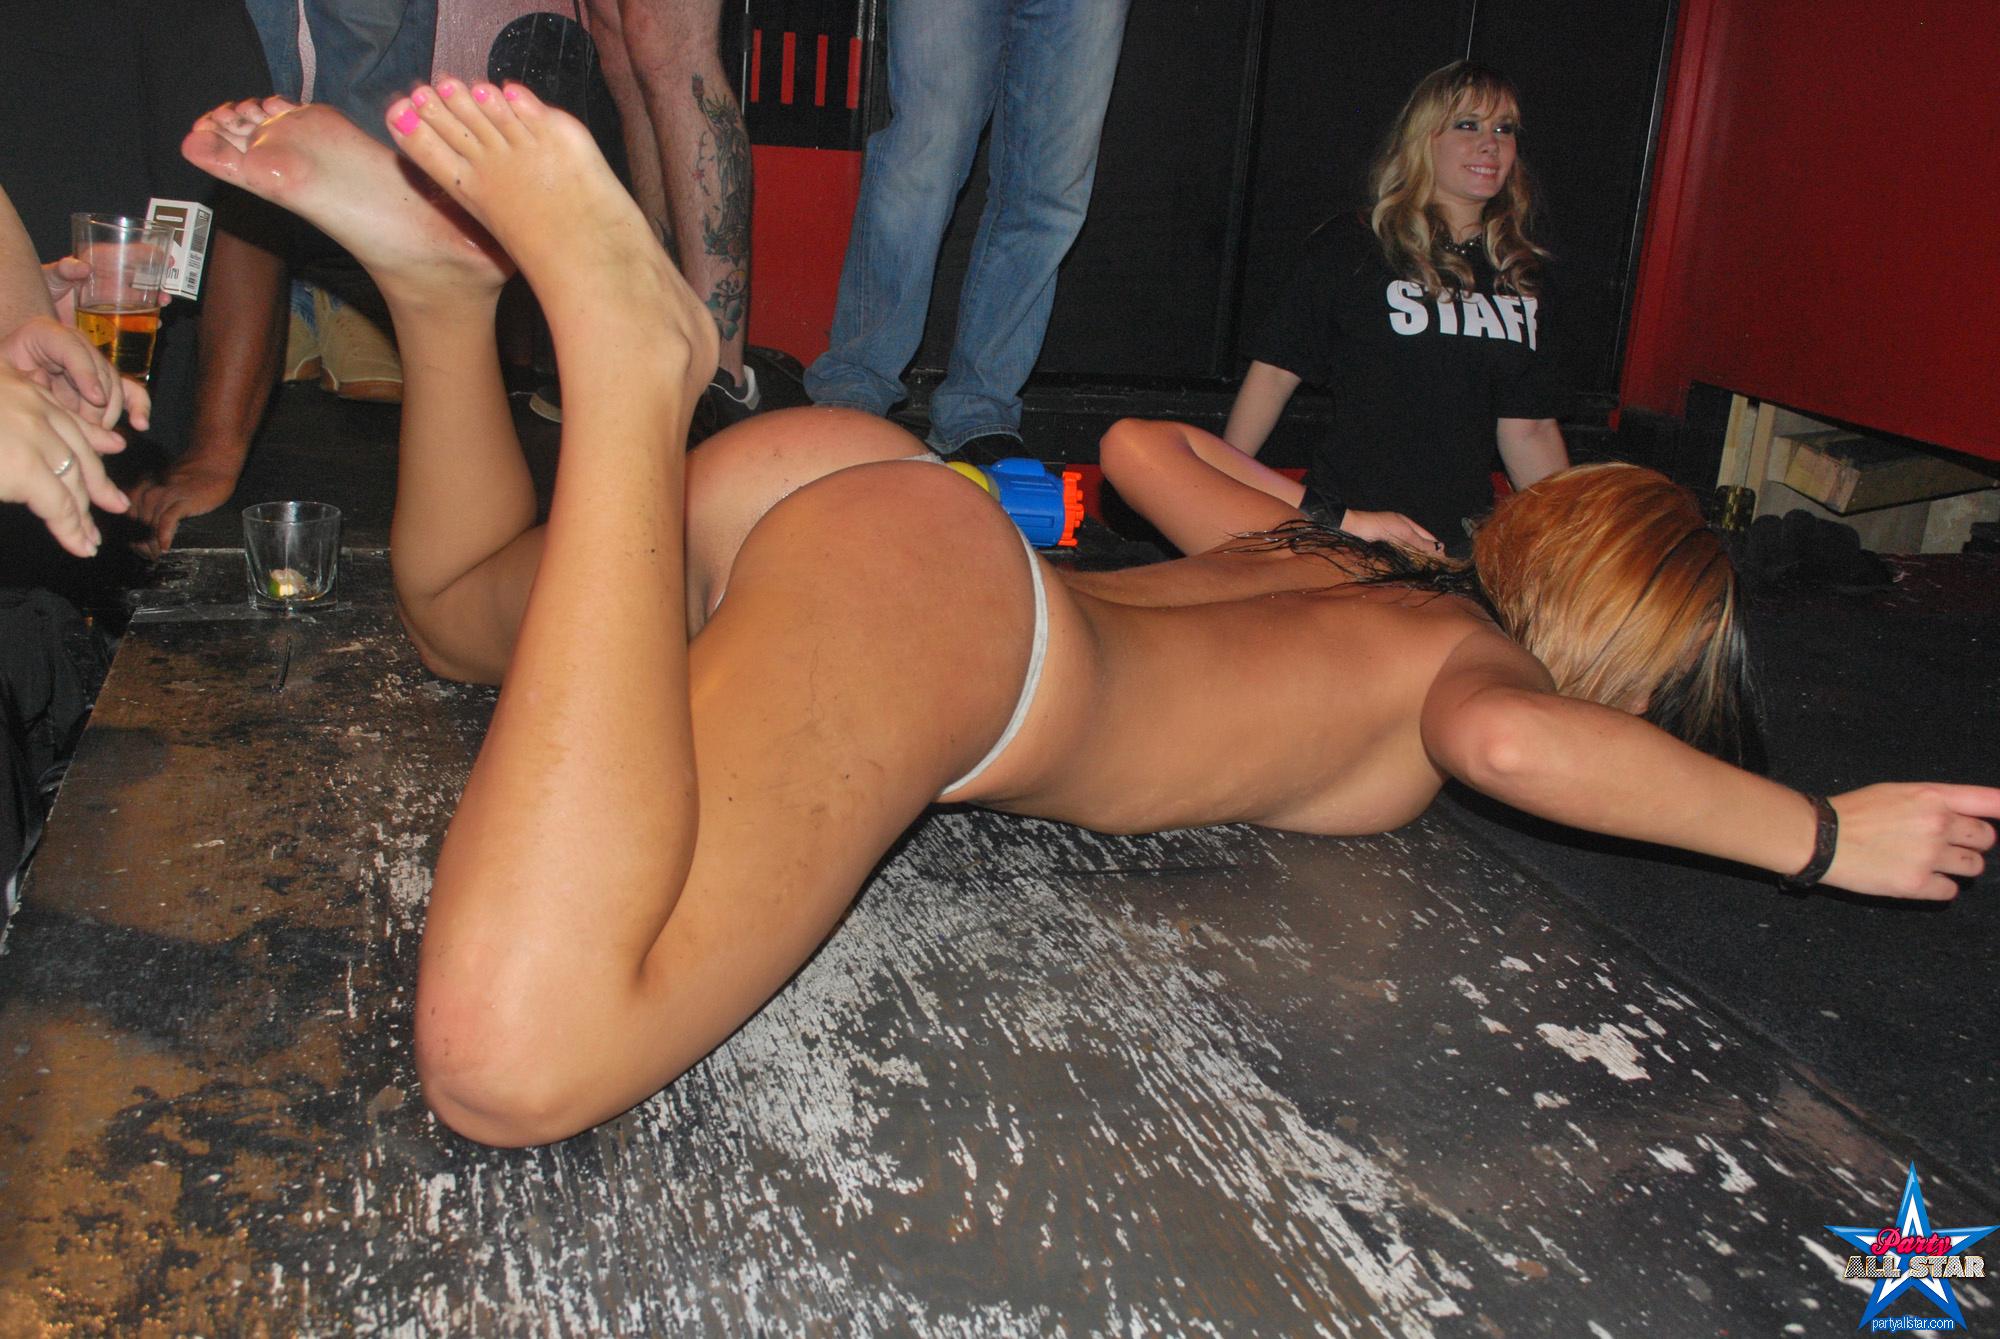 Party sex contest